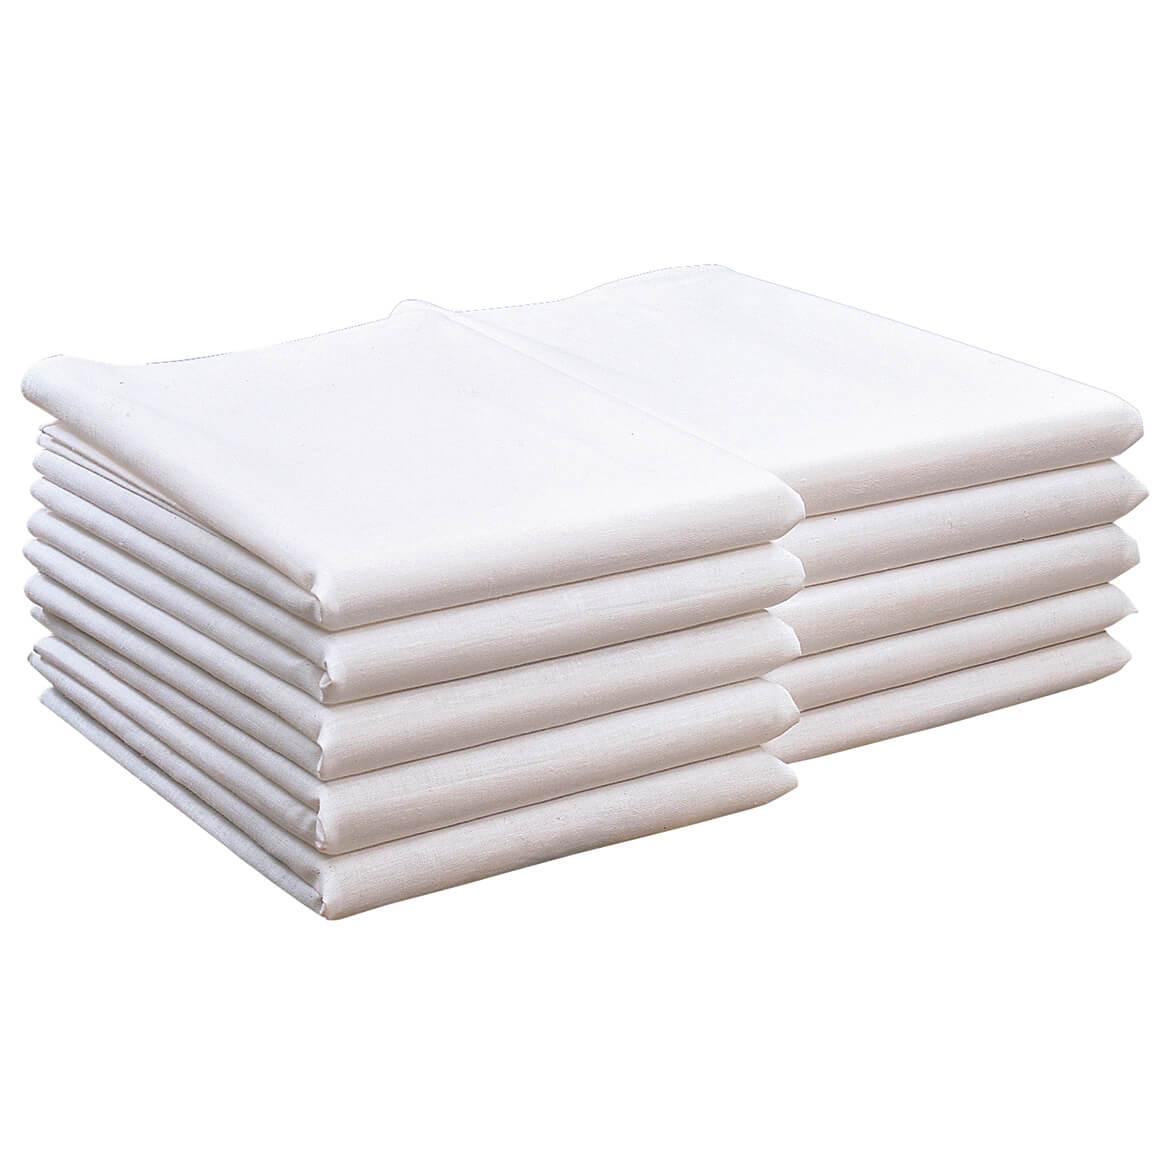 Jumbo Flour Sack Towels S/5-370152